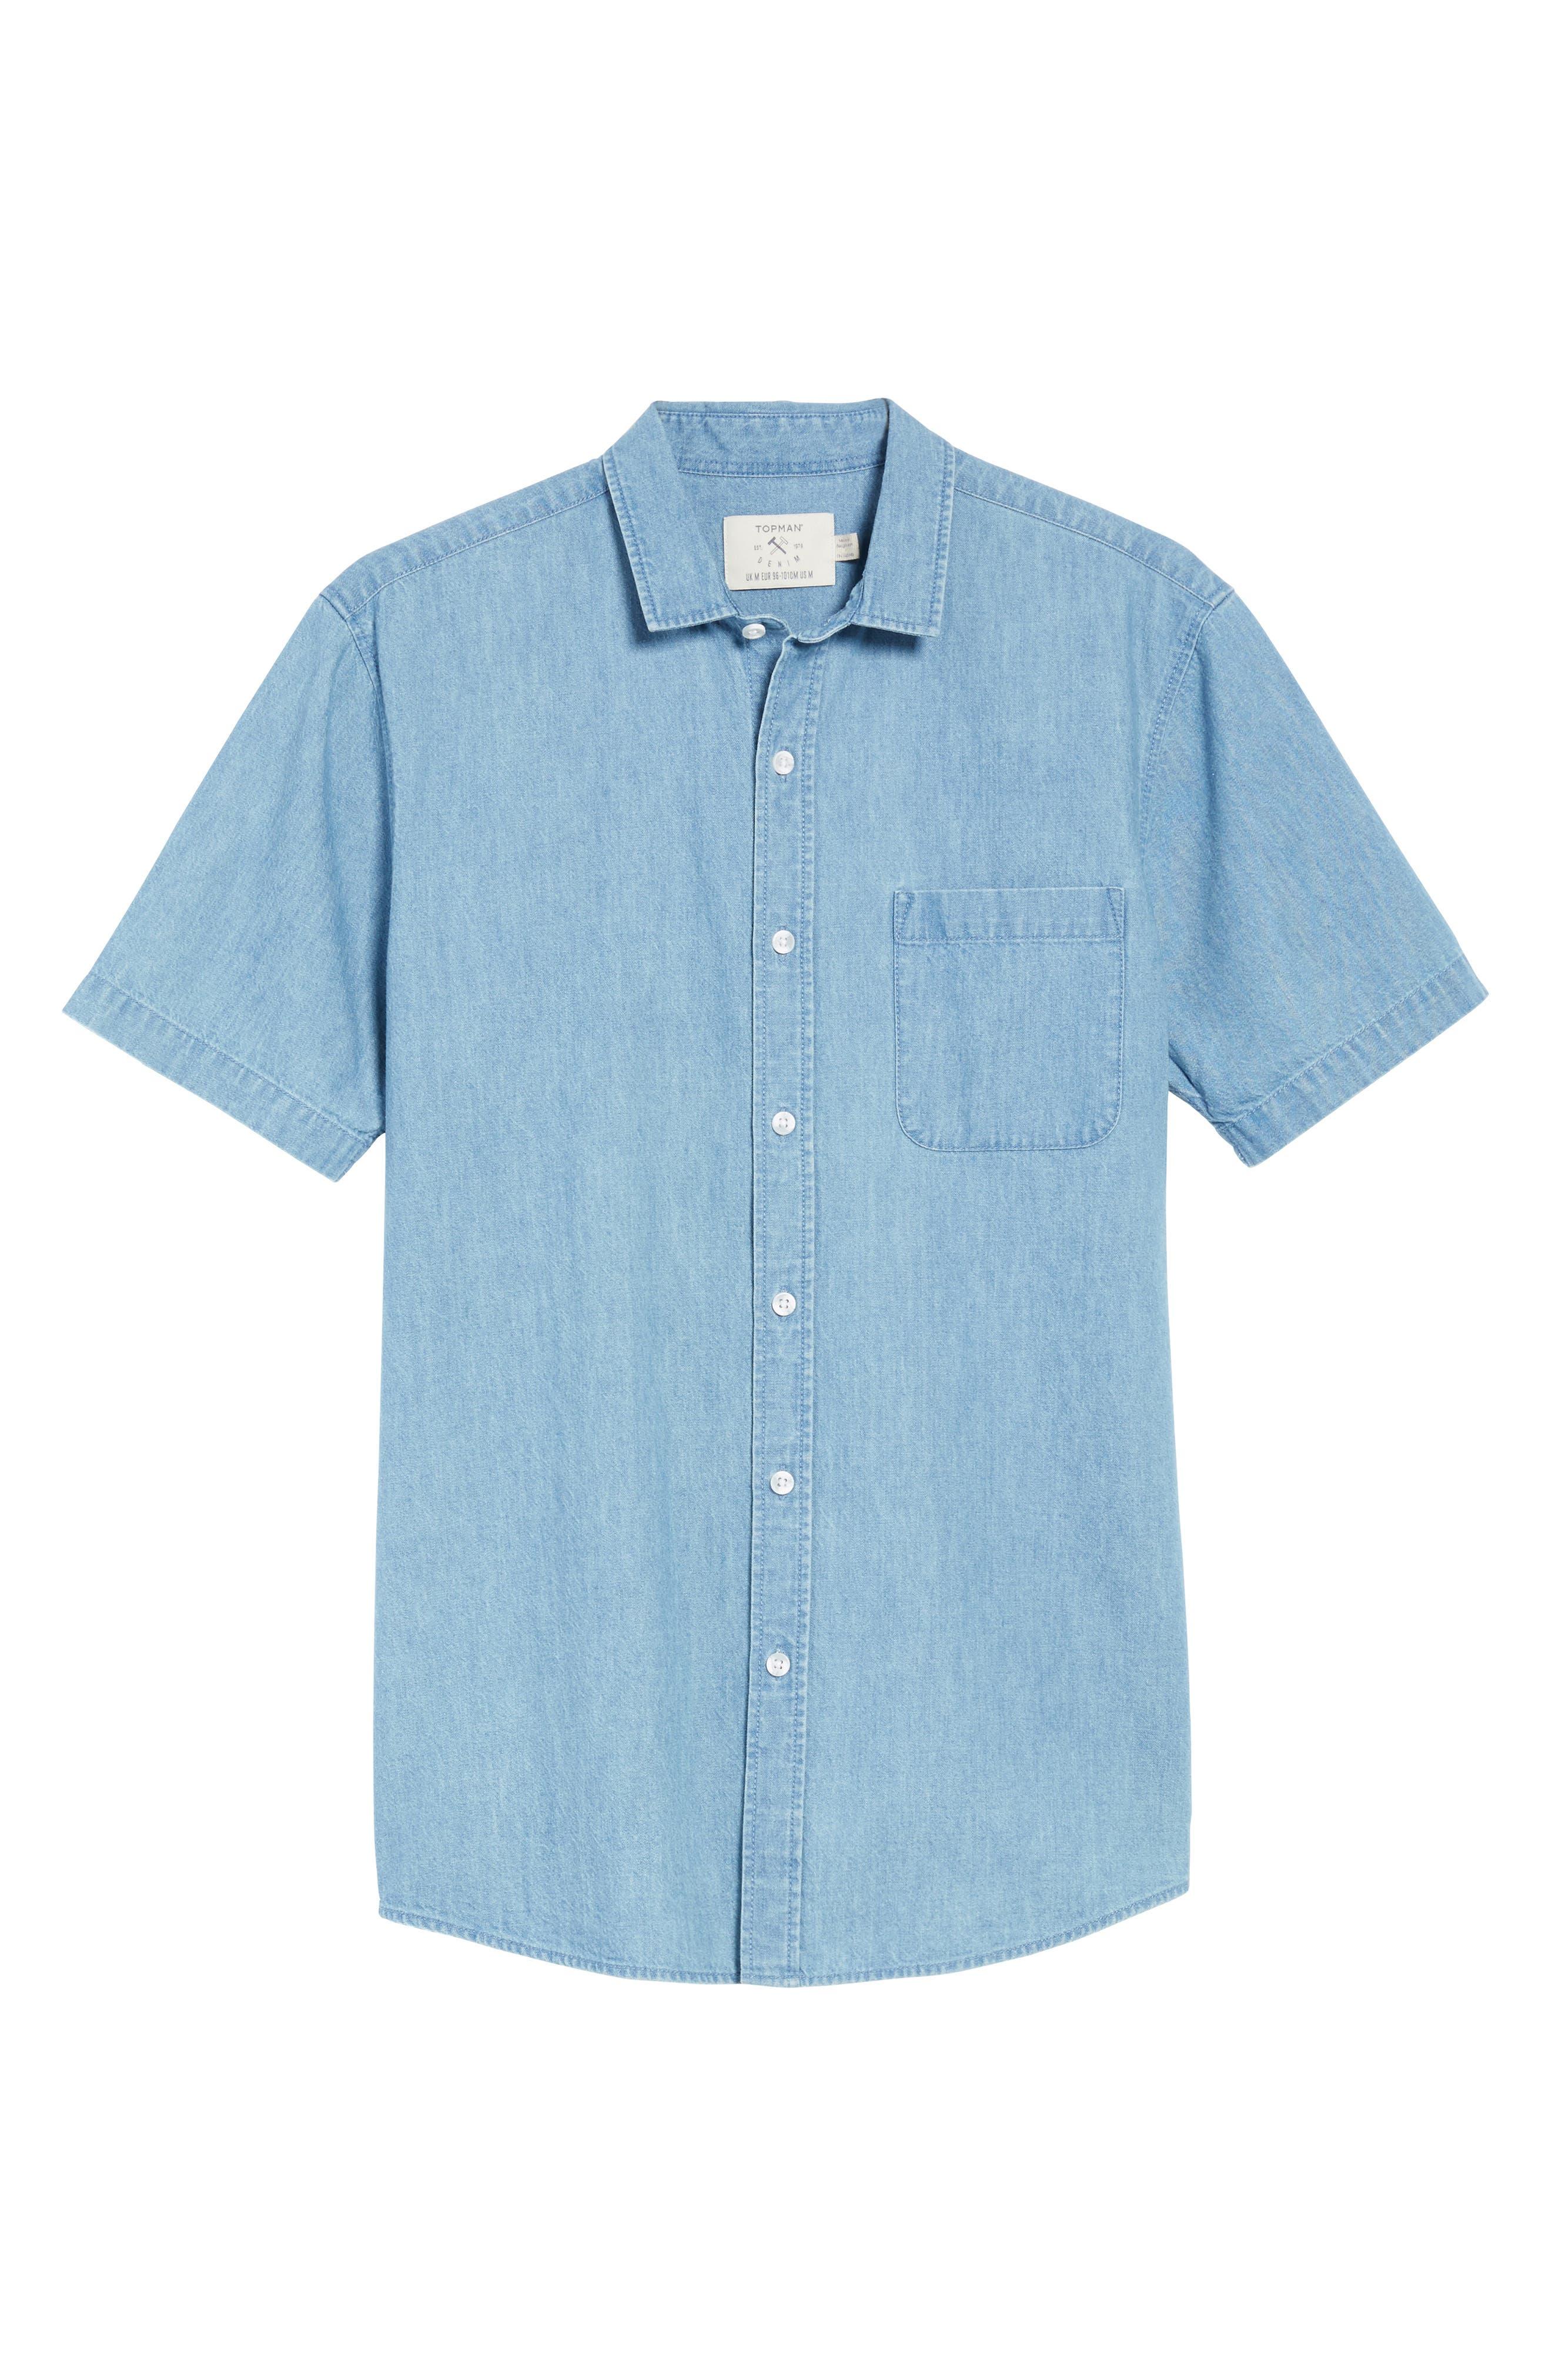 Washed Denim Shirt,                             Alternate thumbnail 6, color,                             Blue